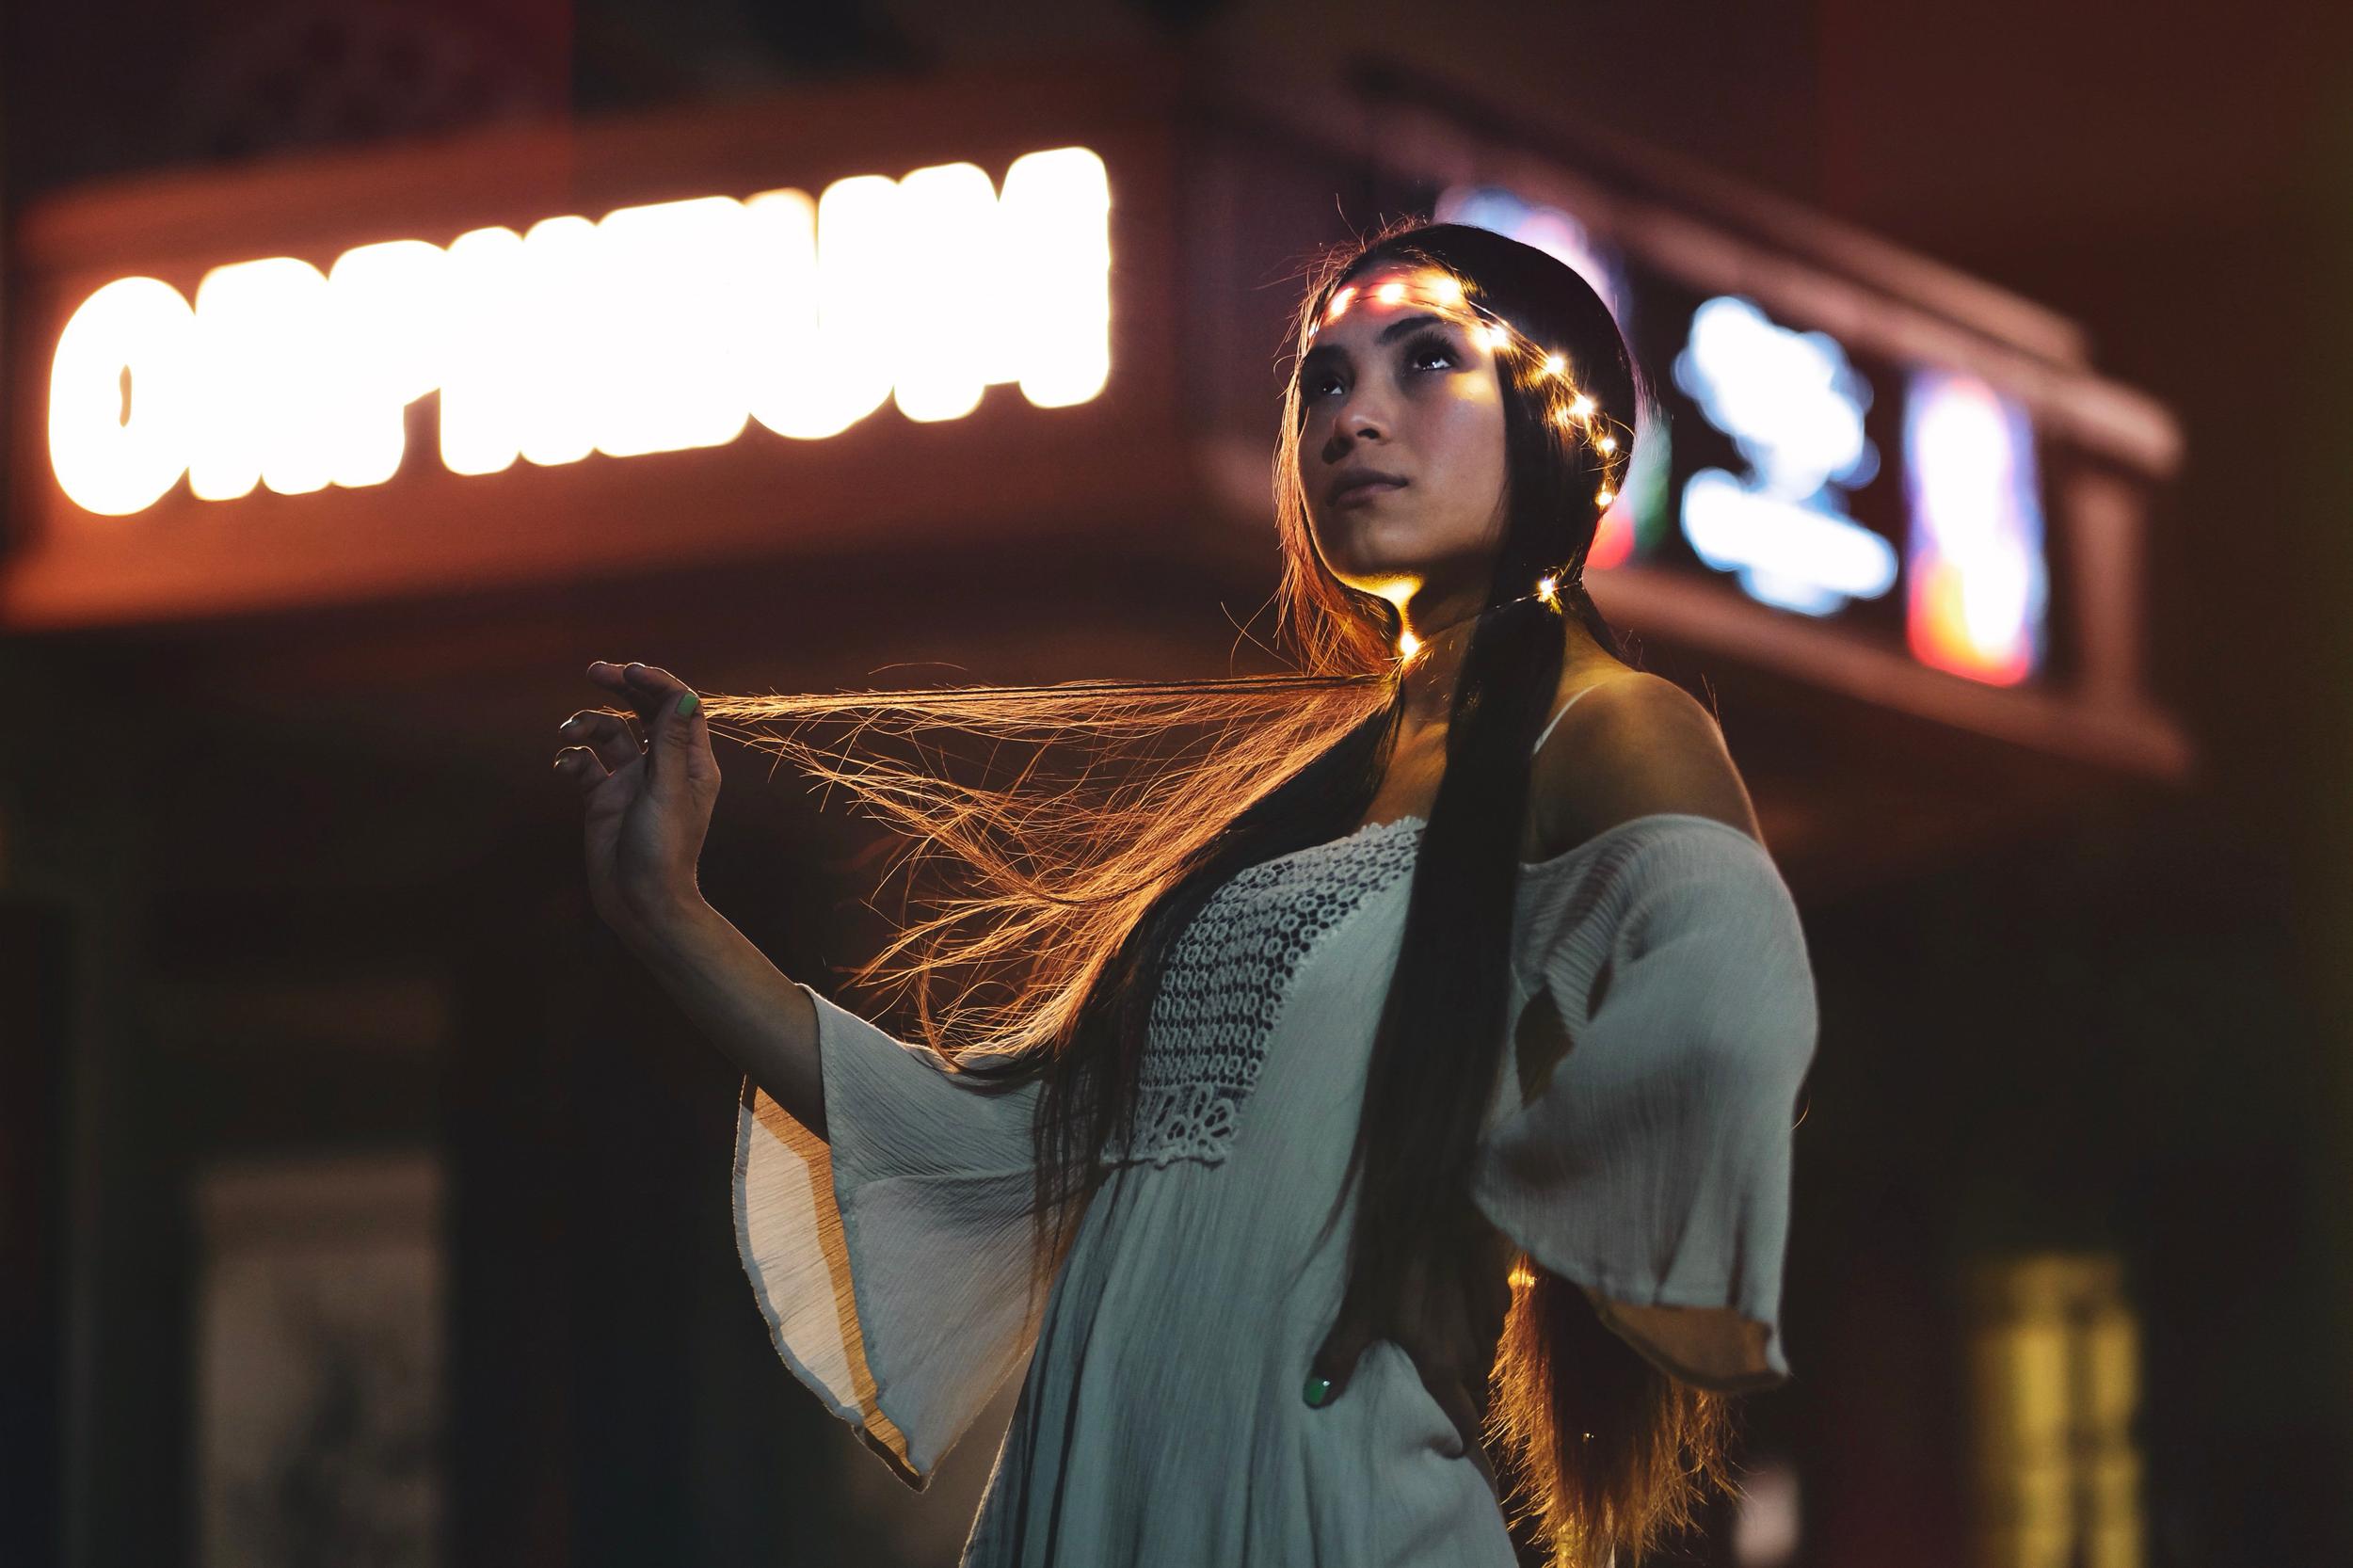 Model: Alex Olvera   Location: Downtown, Phoenix   Date: March, 2019   Lens: 56mm F1.2   Camera: Fujifilm XT-3